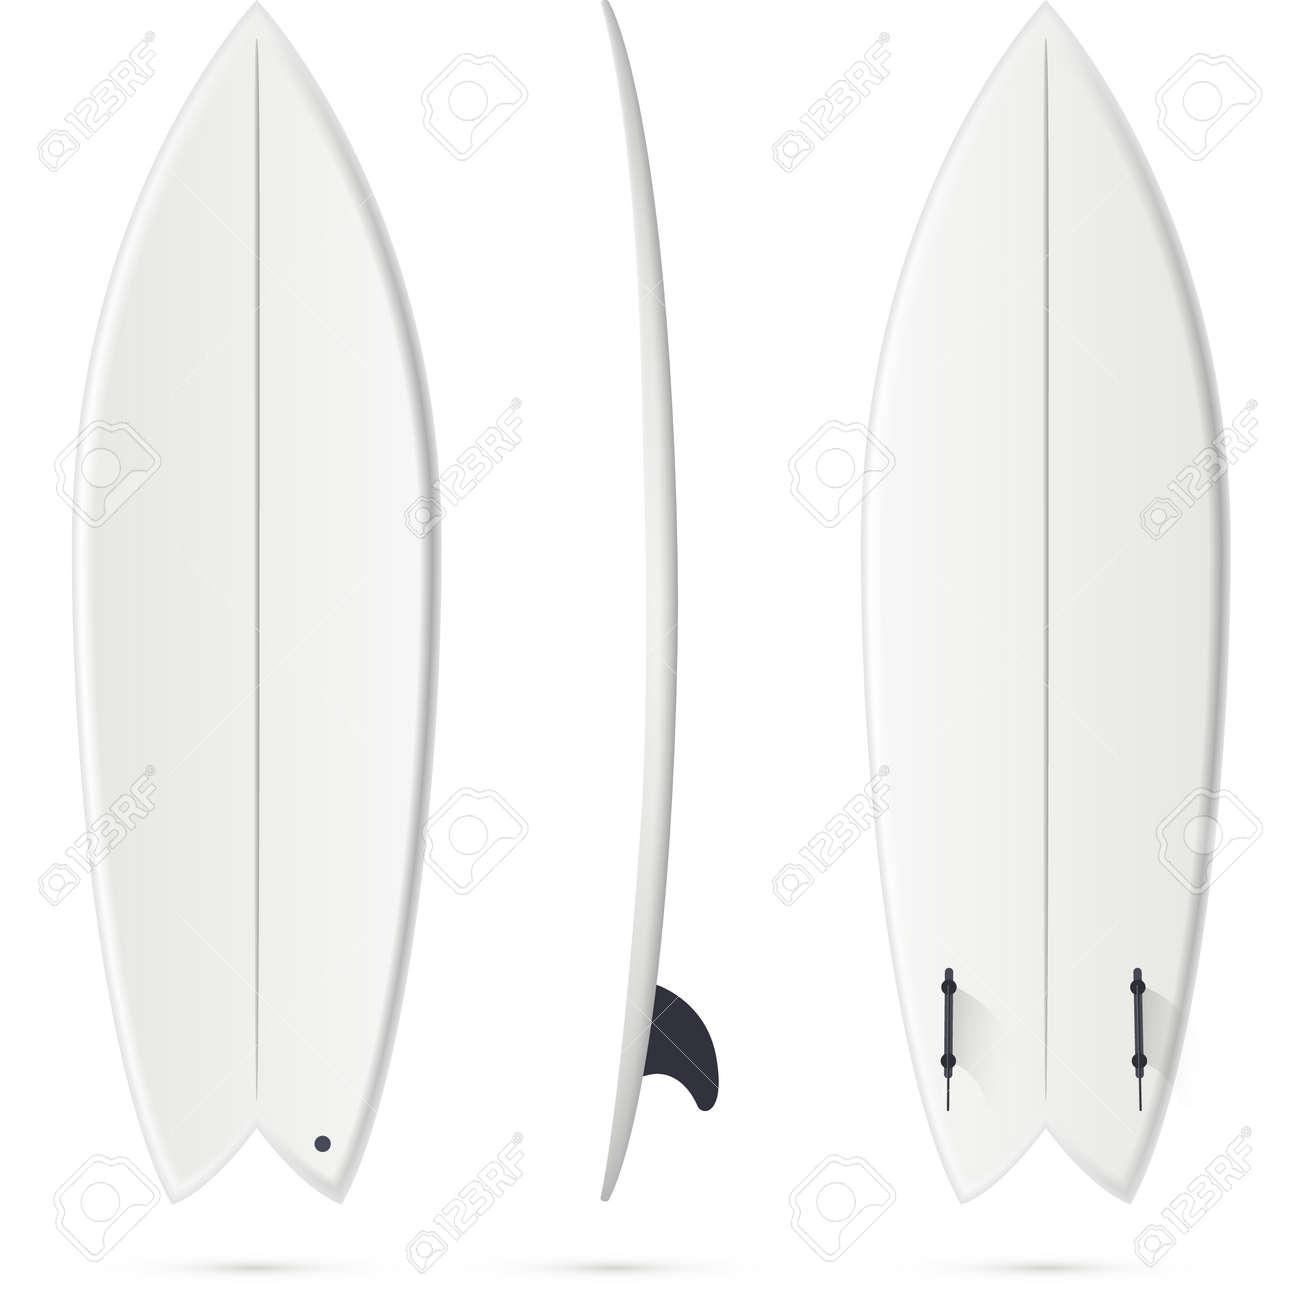 White Vector Surfing Board Template - Fish Surfboard Royalty Free ... 350e5e987aec